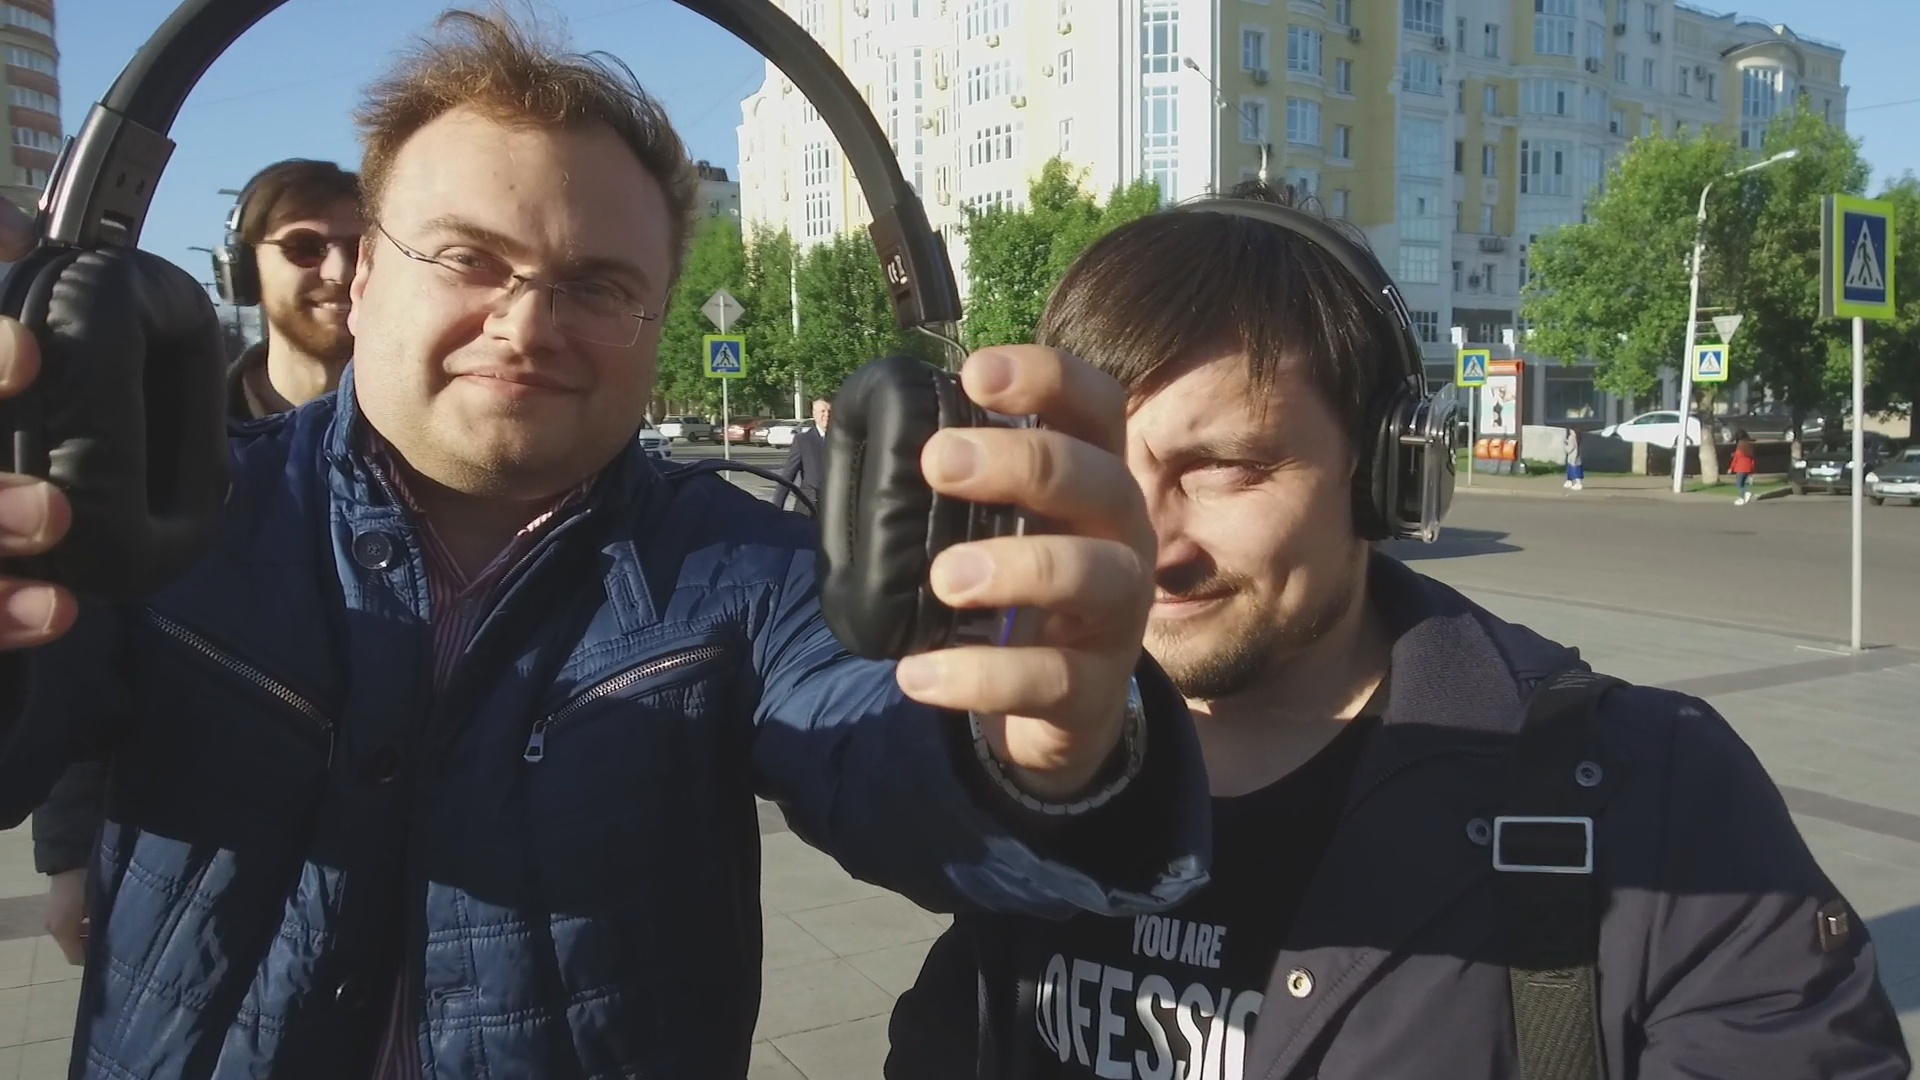 Яндекс уфа из рук в руки знакомства знакомства с девушками из осинников